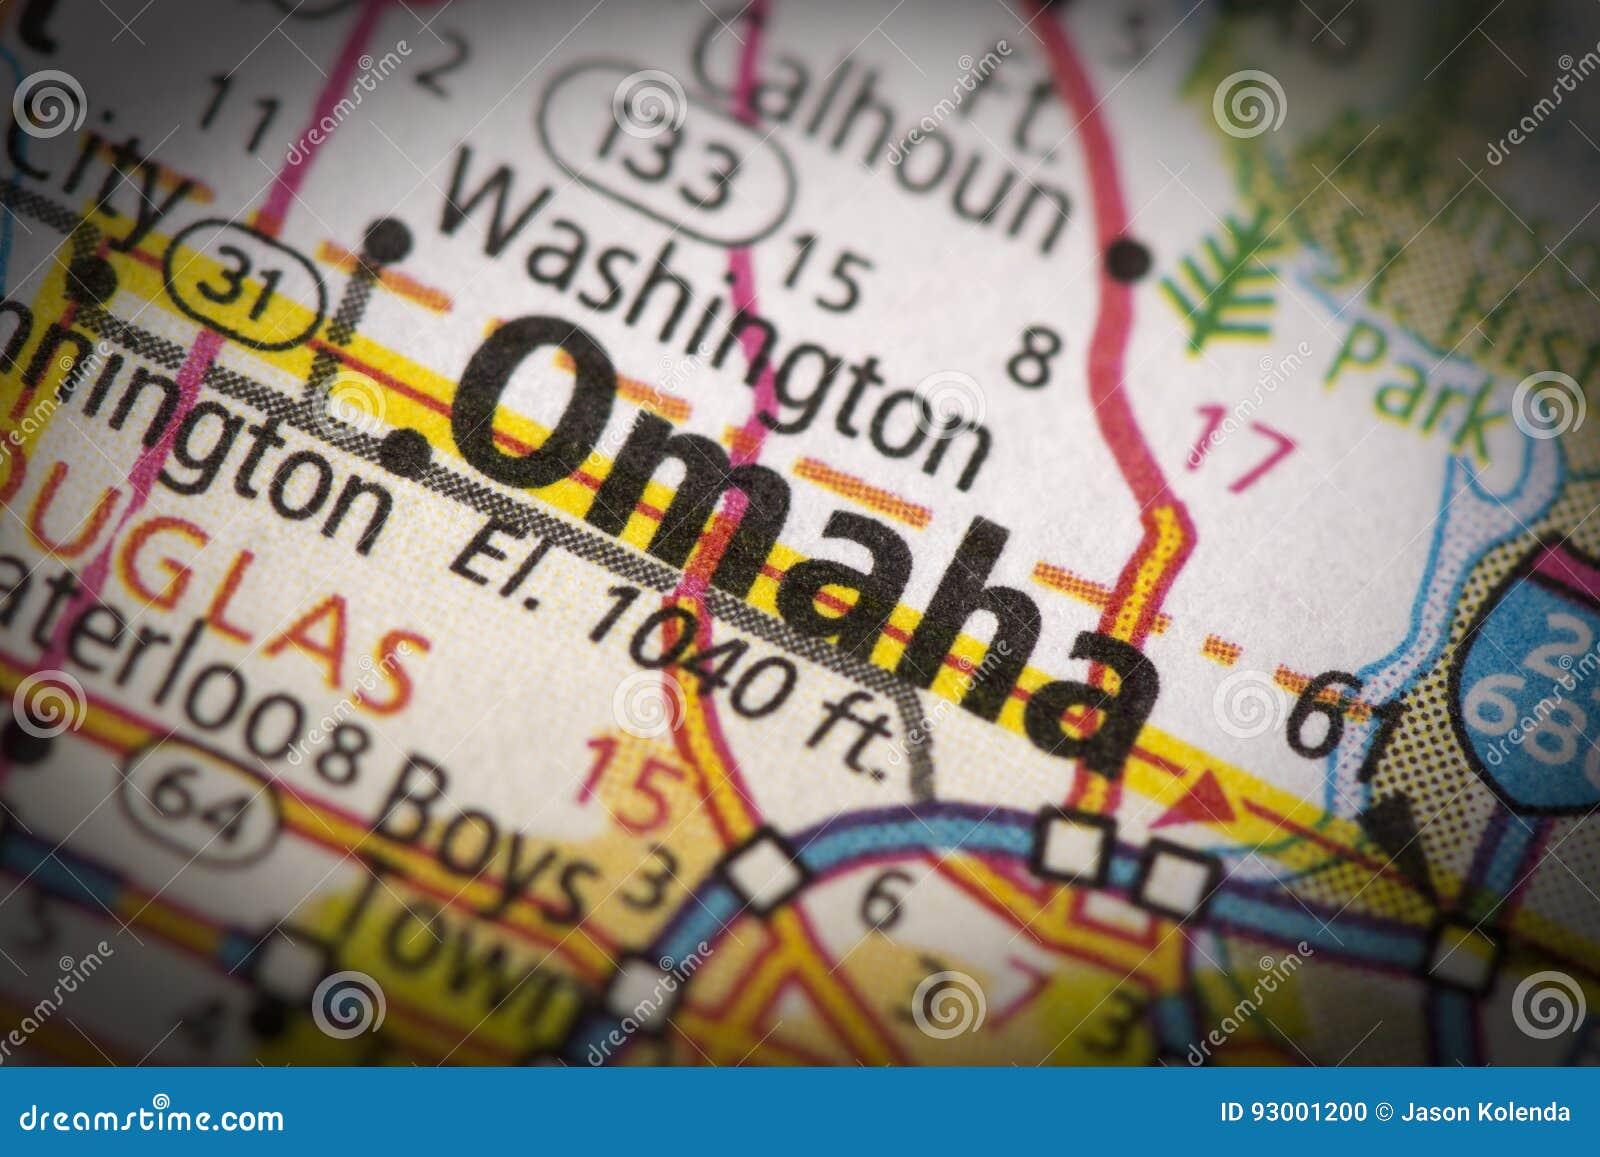 Omaha, Nebraska na mapie